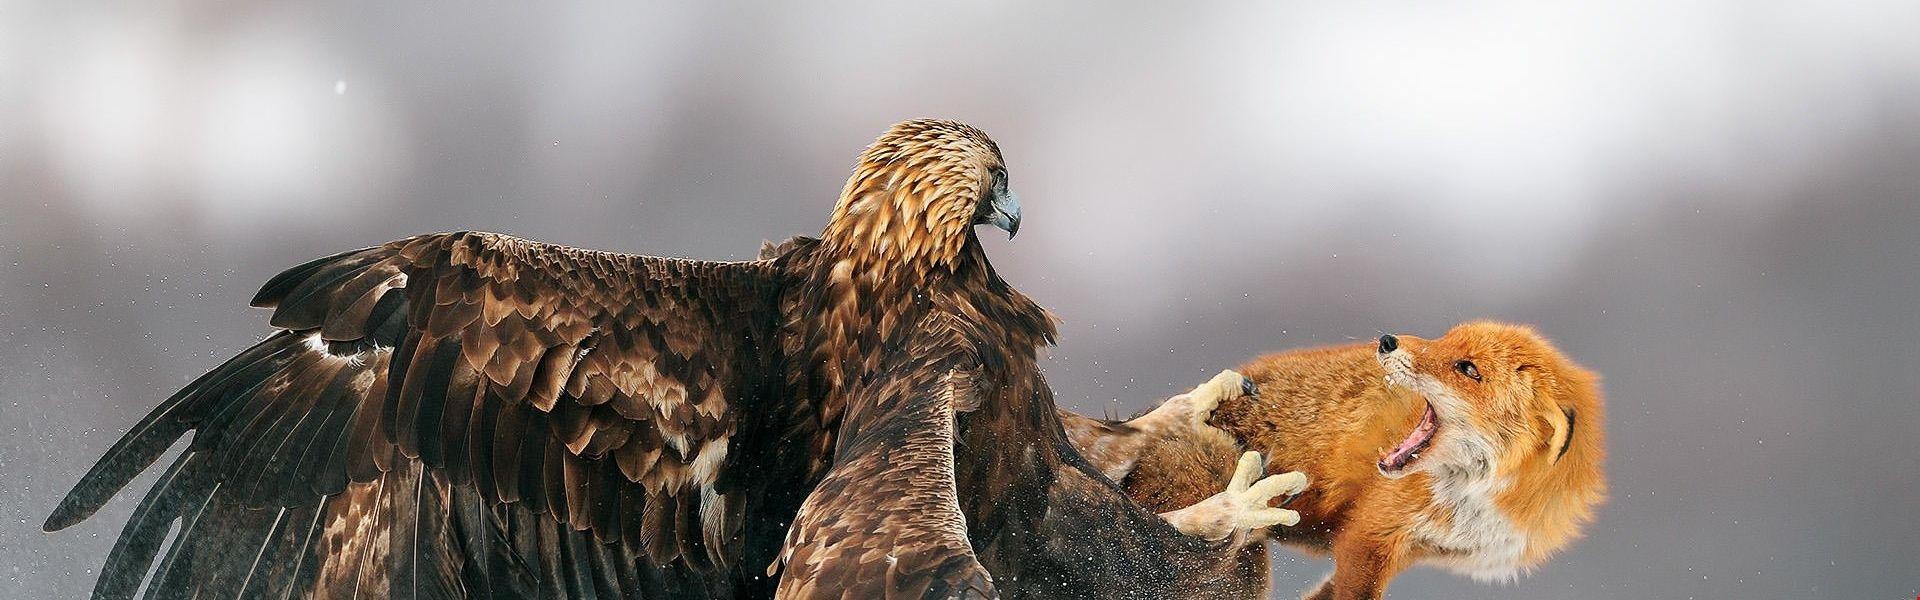 тоже картинки орел и лиса уверен, что